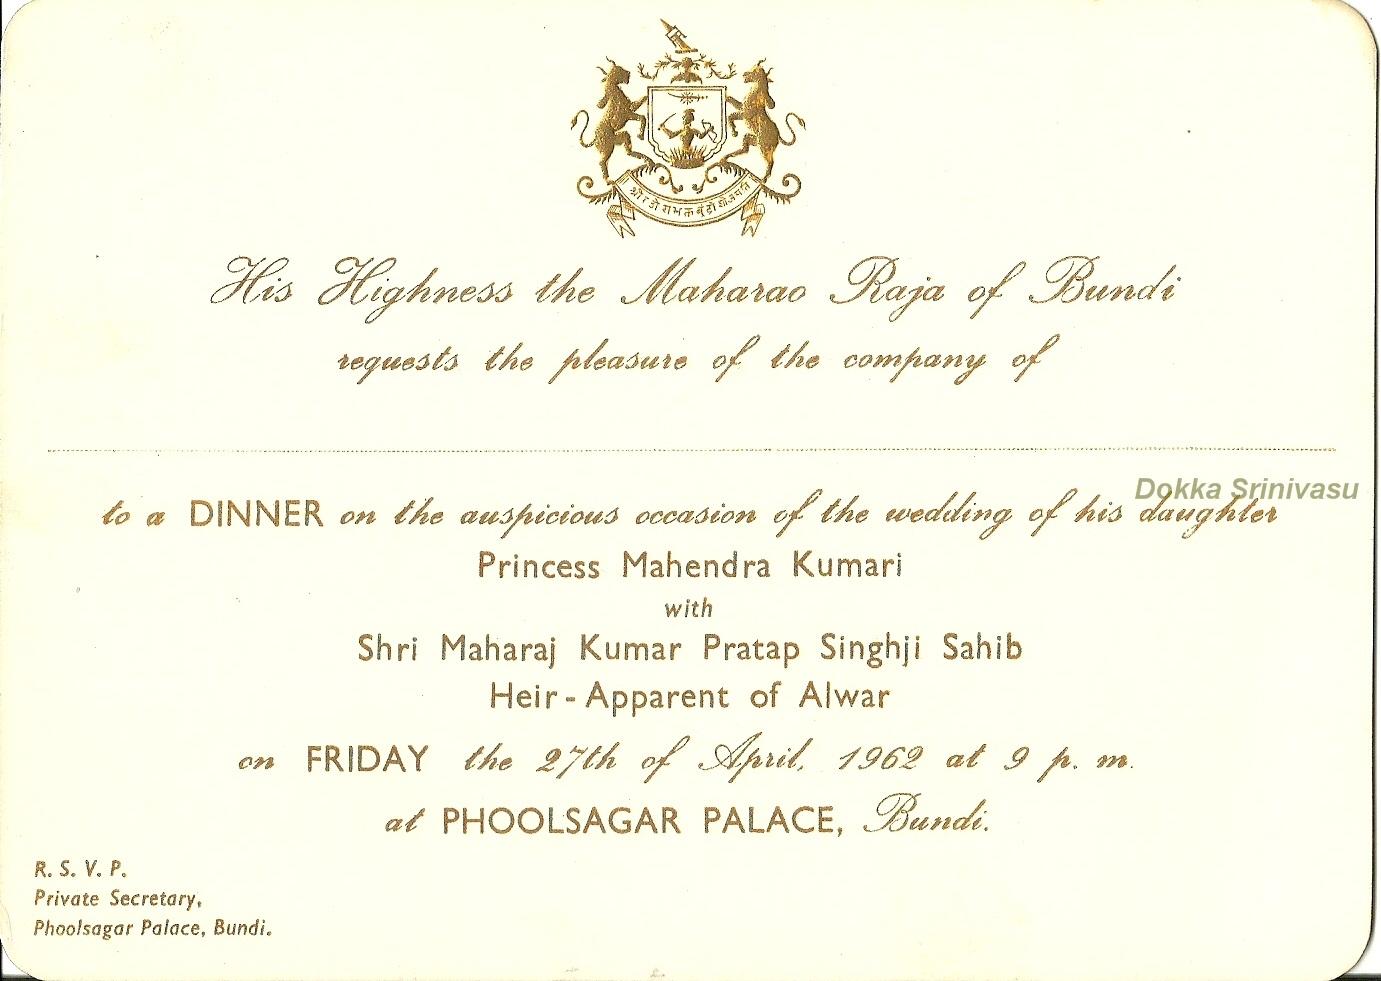 Heritage of India: Vintage Invitation Cards of India